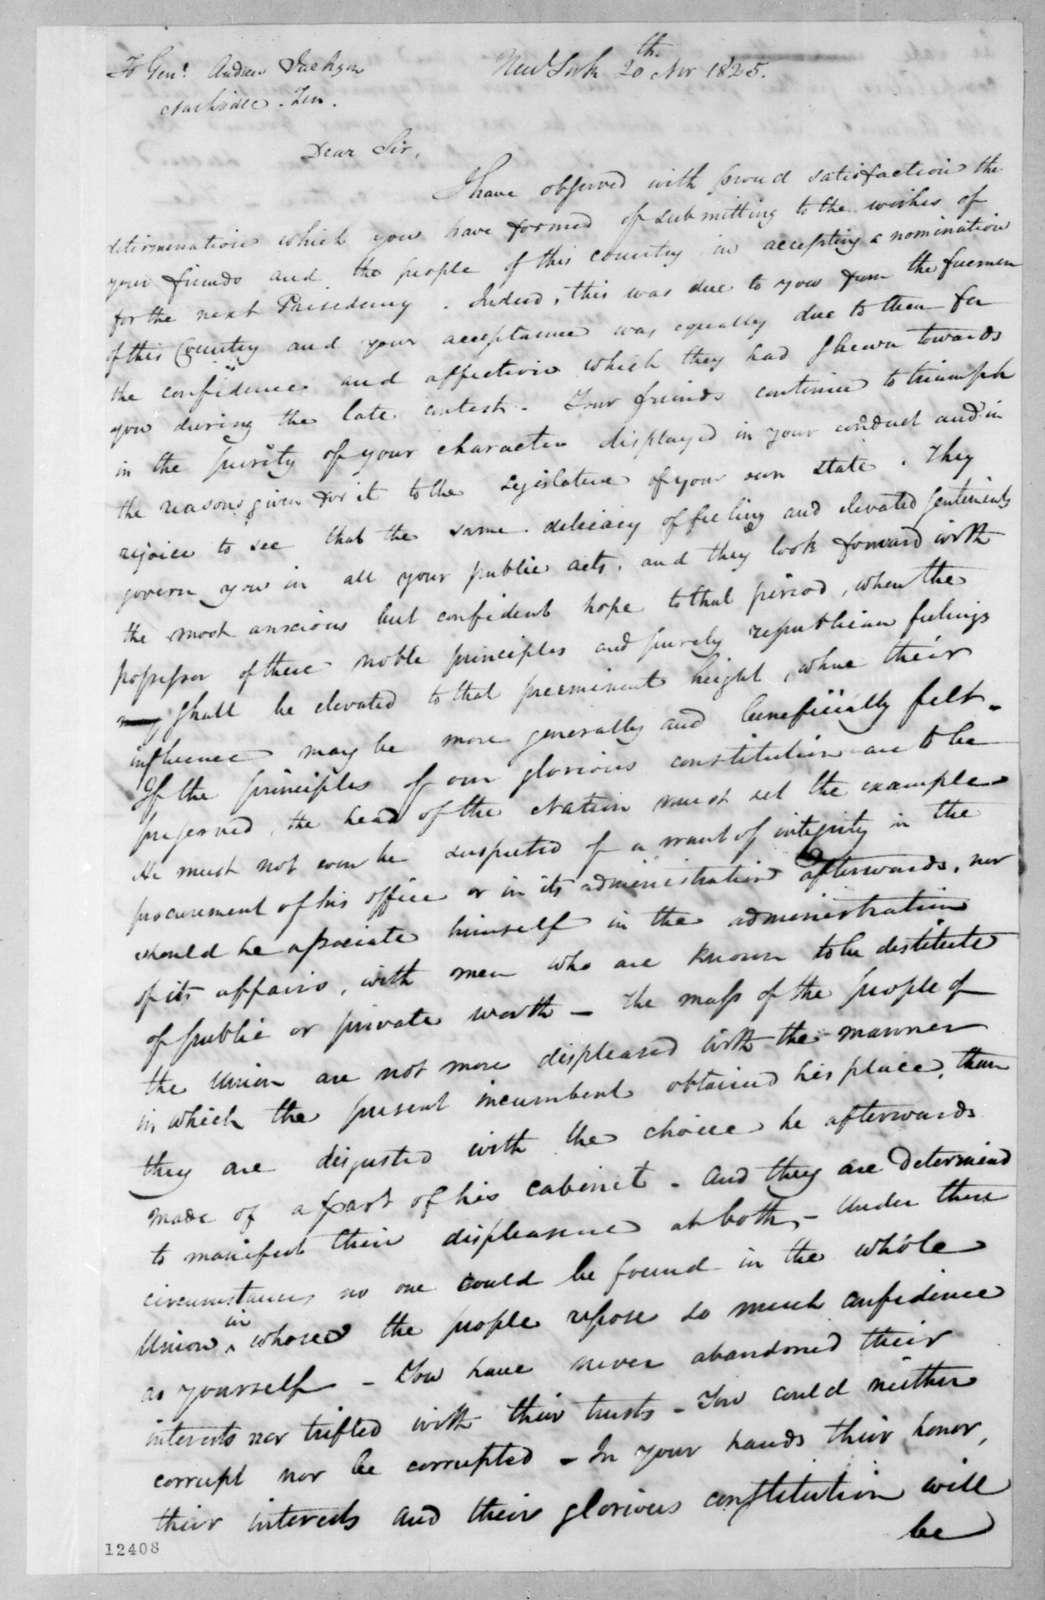 Samuel Swartwout to Andrew Jackson, November 20, 1825